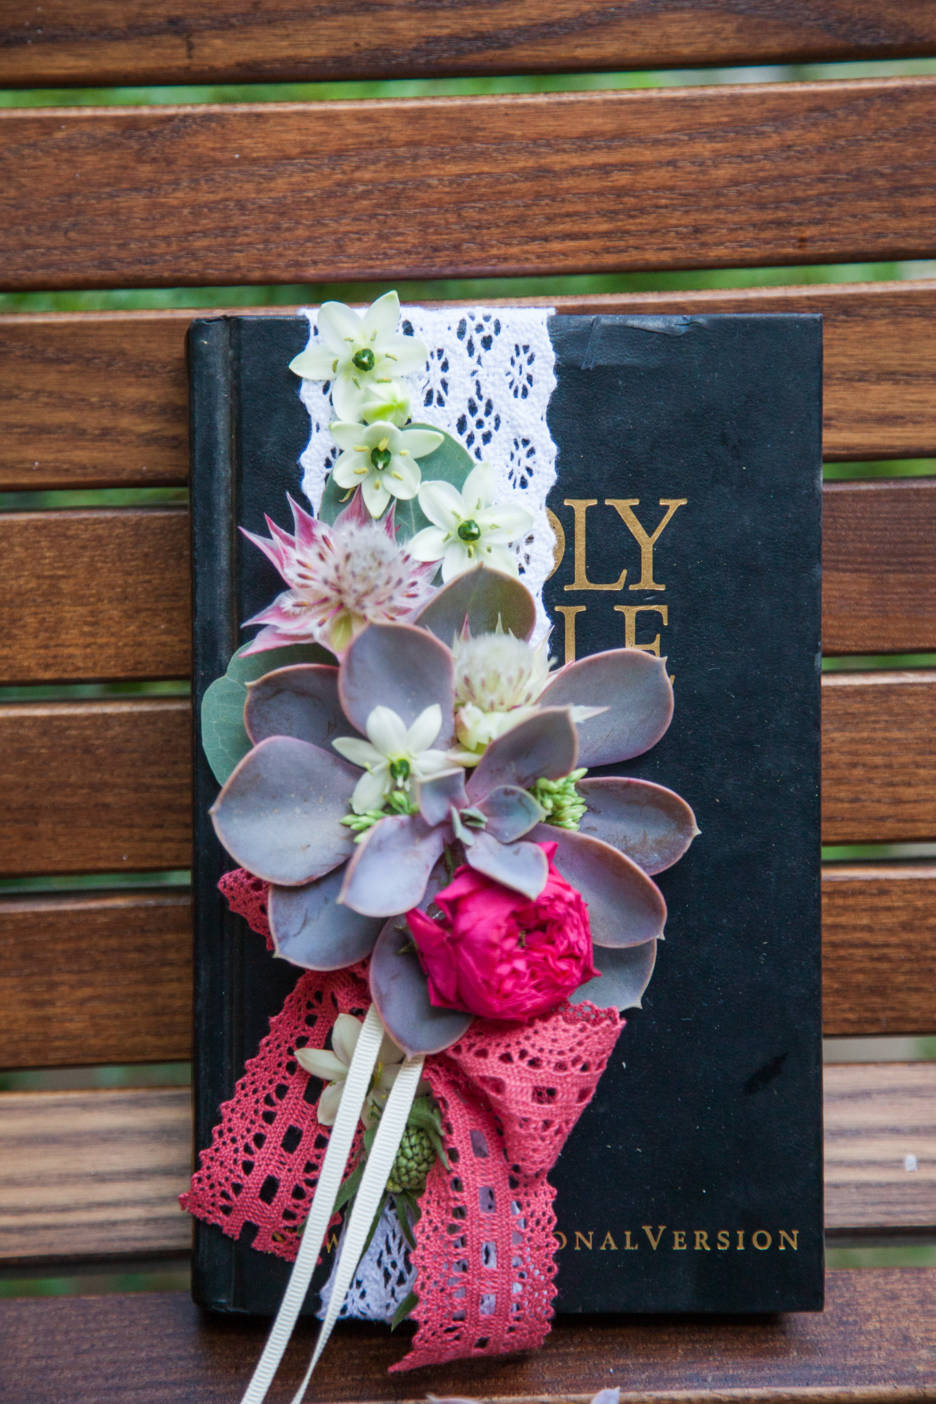 Poza, foto cu Flori de nunta decor colt photo, pernita verighete in Arad, Timisoara, Oradea (wedding flowers, bouquets) nunta Arad, Timisoara, Oradea